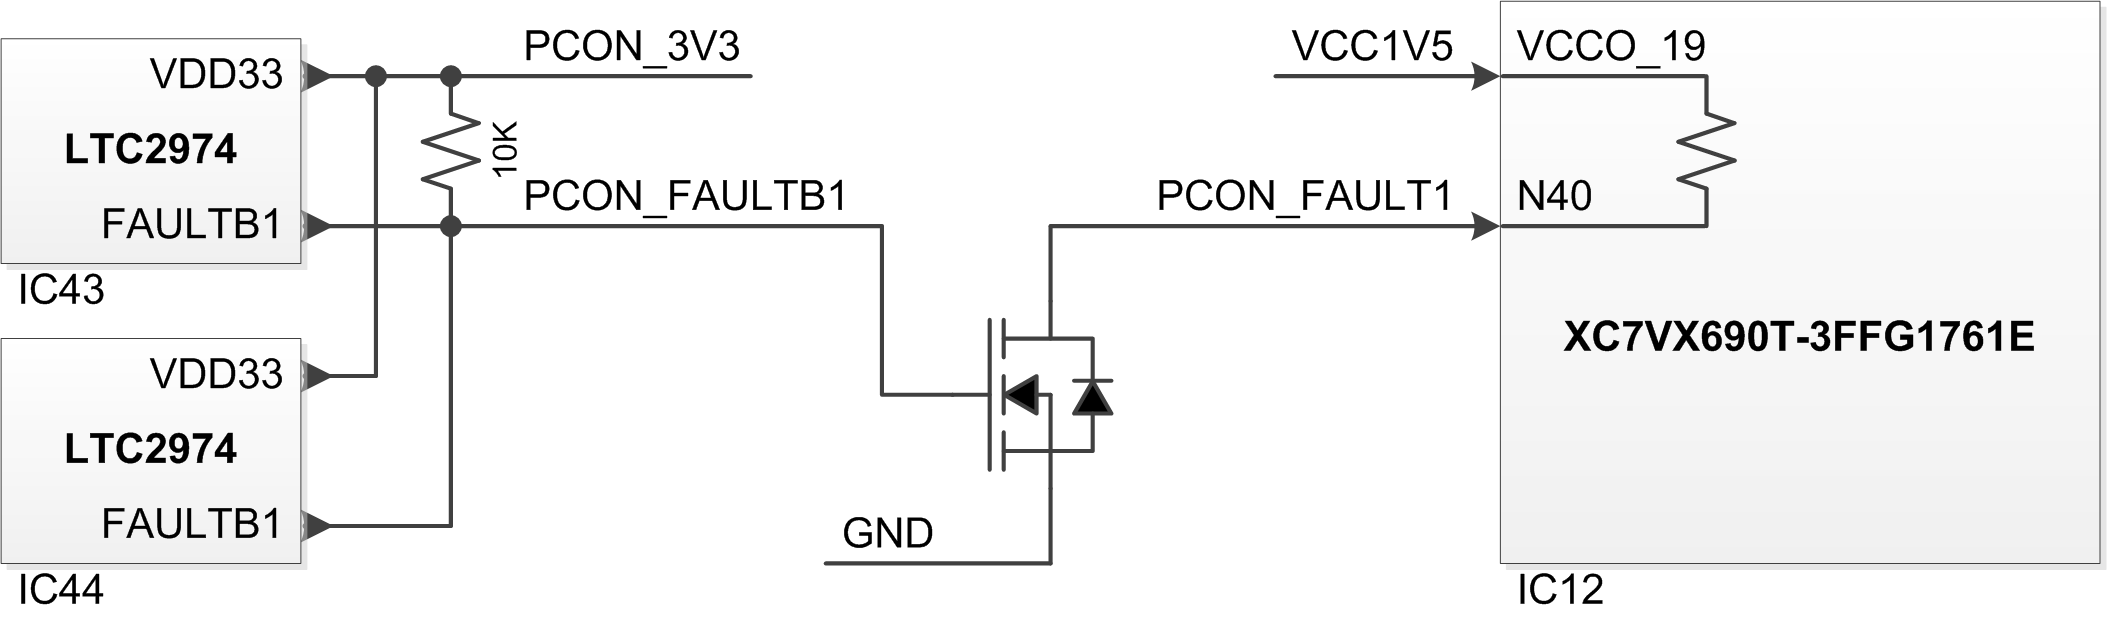 Netfpga Sume Reference Manual Referencedigilentinc Virtex 7 Block Diagram Faultb1 Interrupt Source